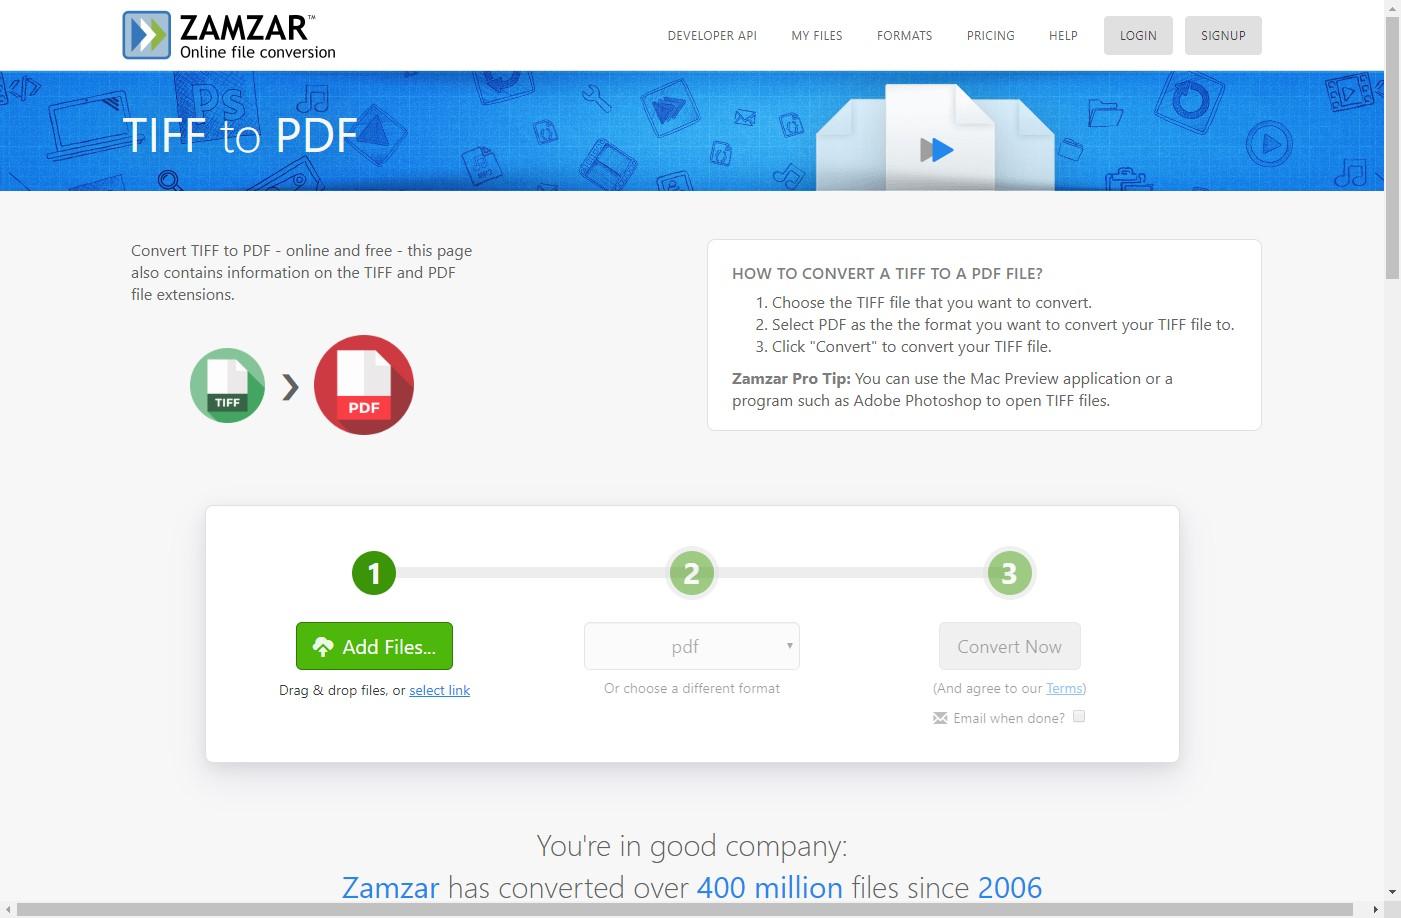 zamzar tiff to pdf converter online